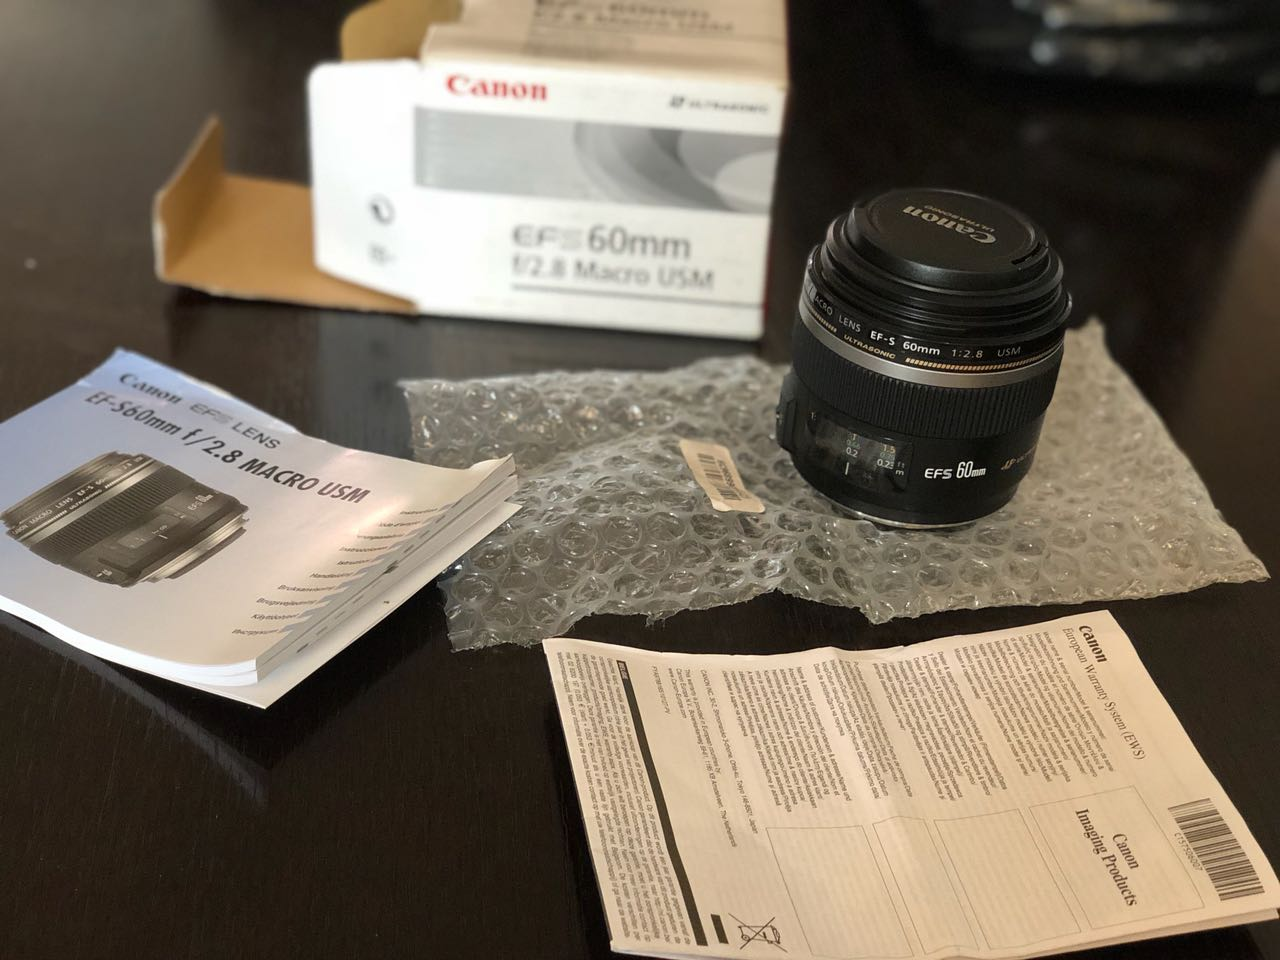 Brand New UltraSonic Canon EFS EF-S60mm f/ 2.8 Macro USM Lens for Sale...